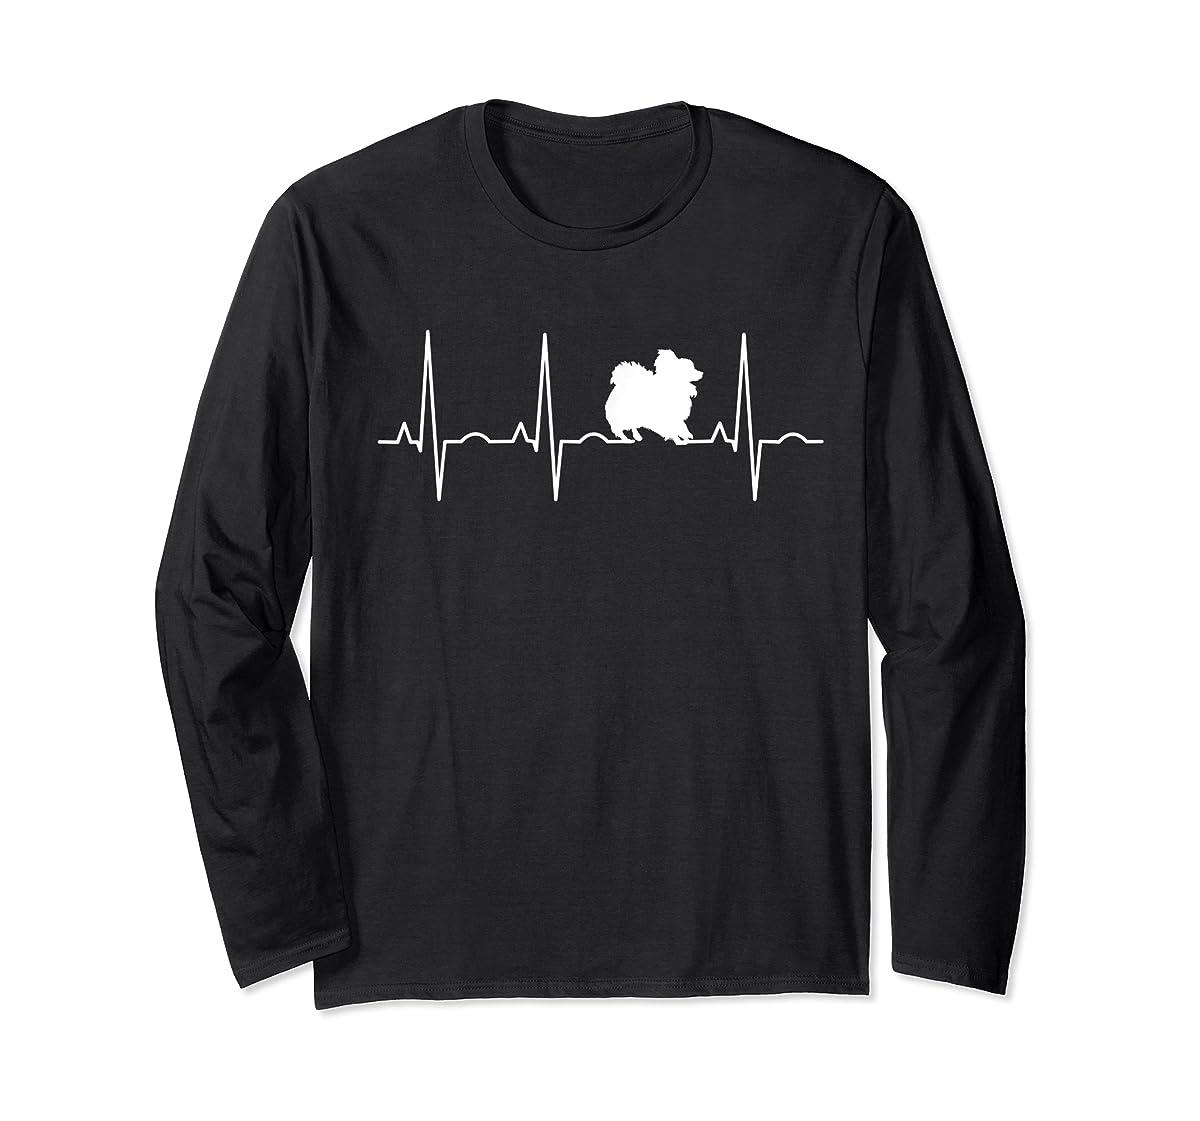 Pomeranian Heartbeat T-Shirt Pom Shirt Gifts Dog Lover-Long Sleeve-Black